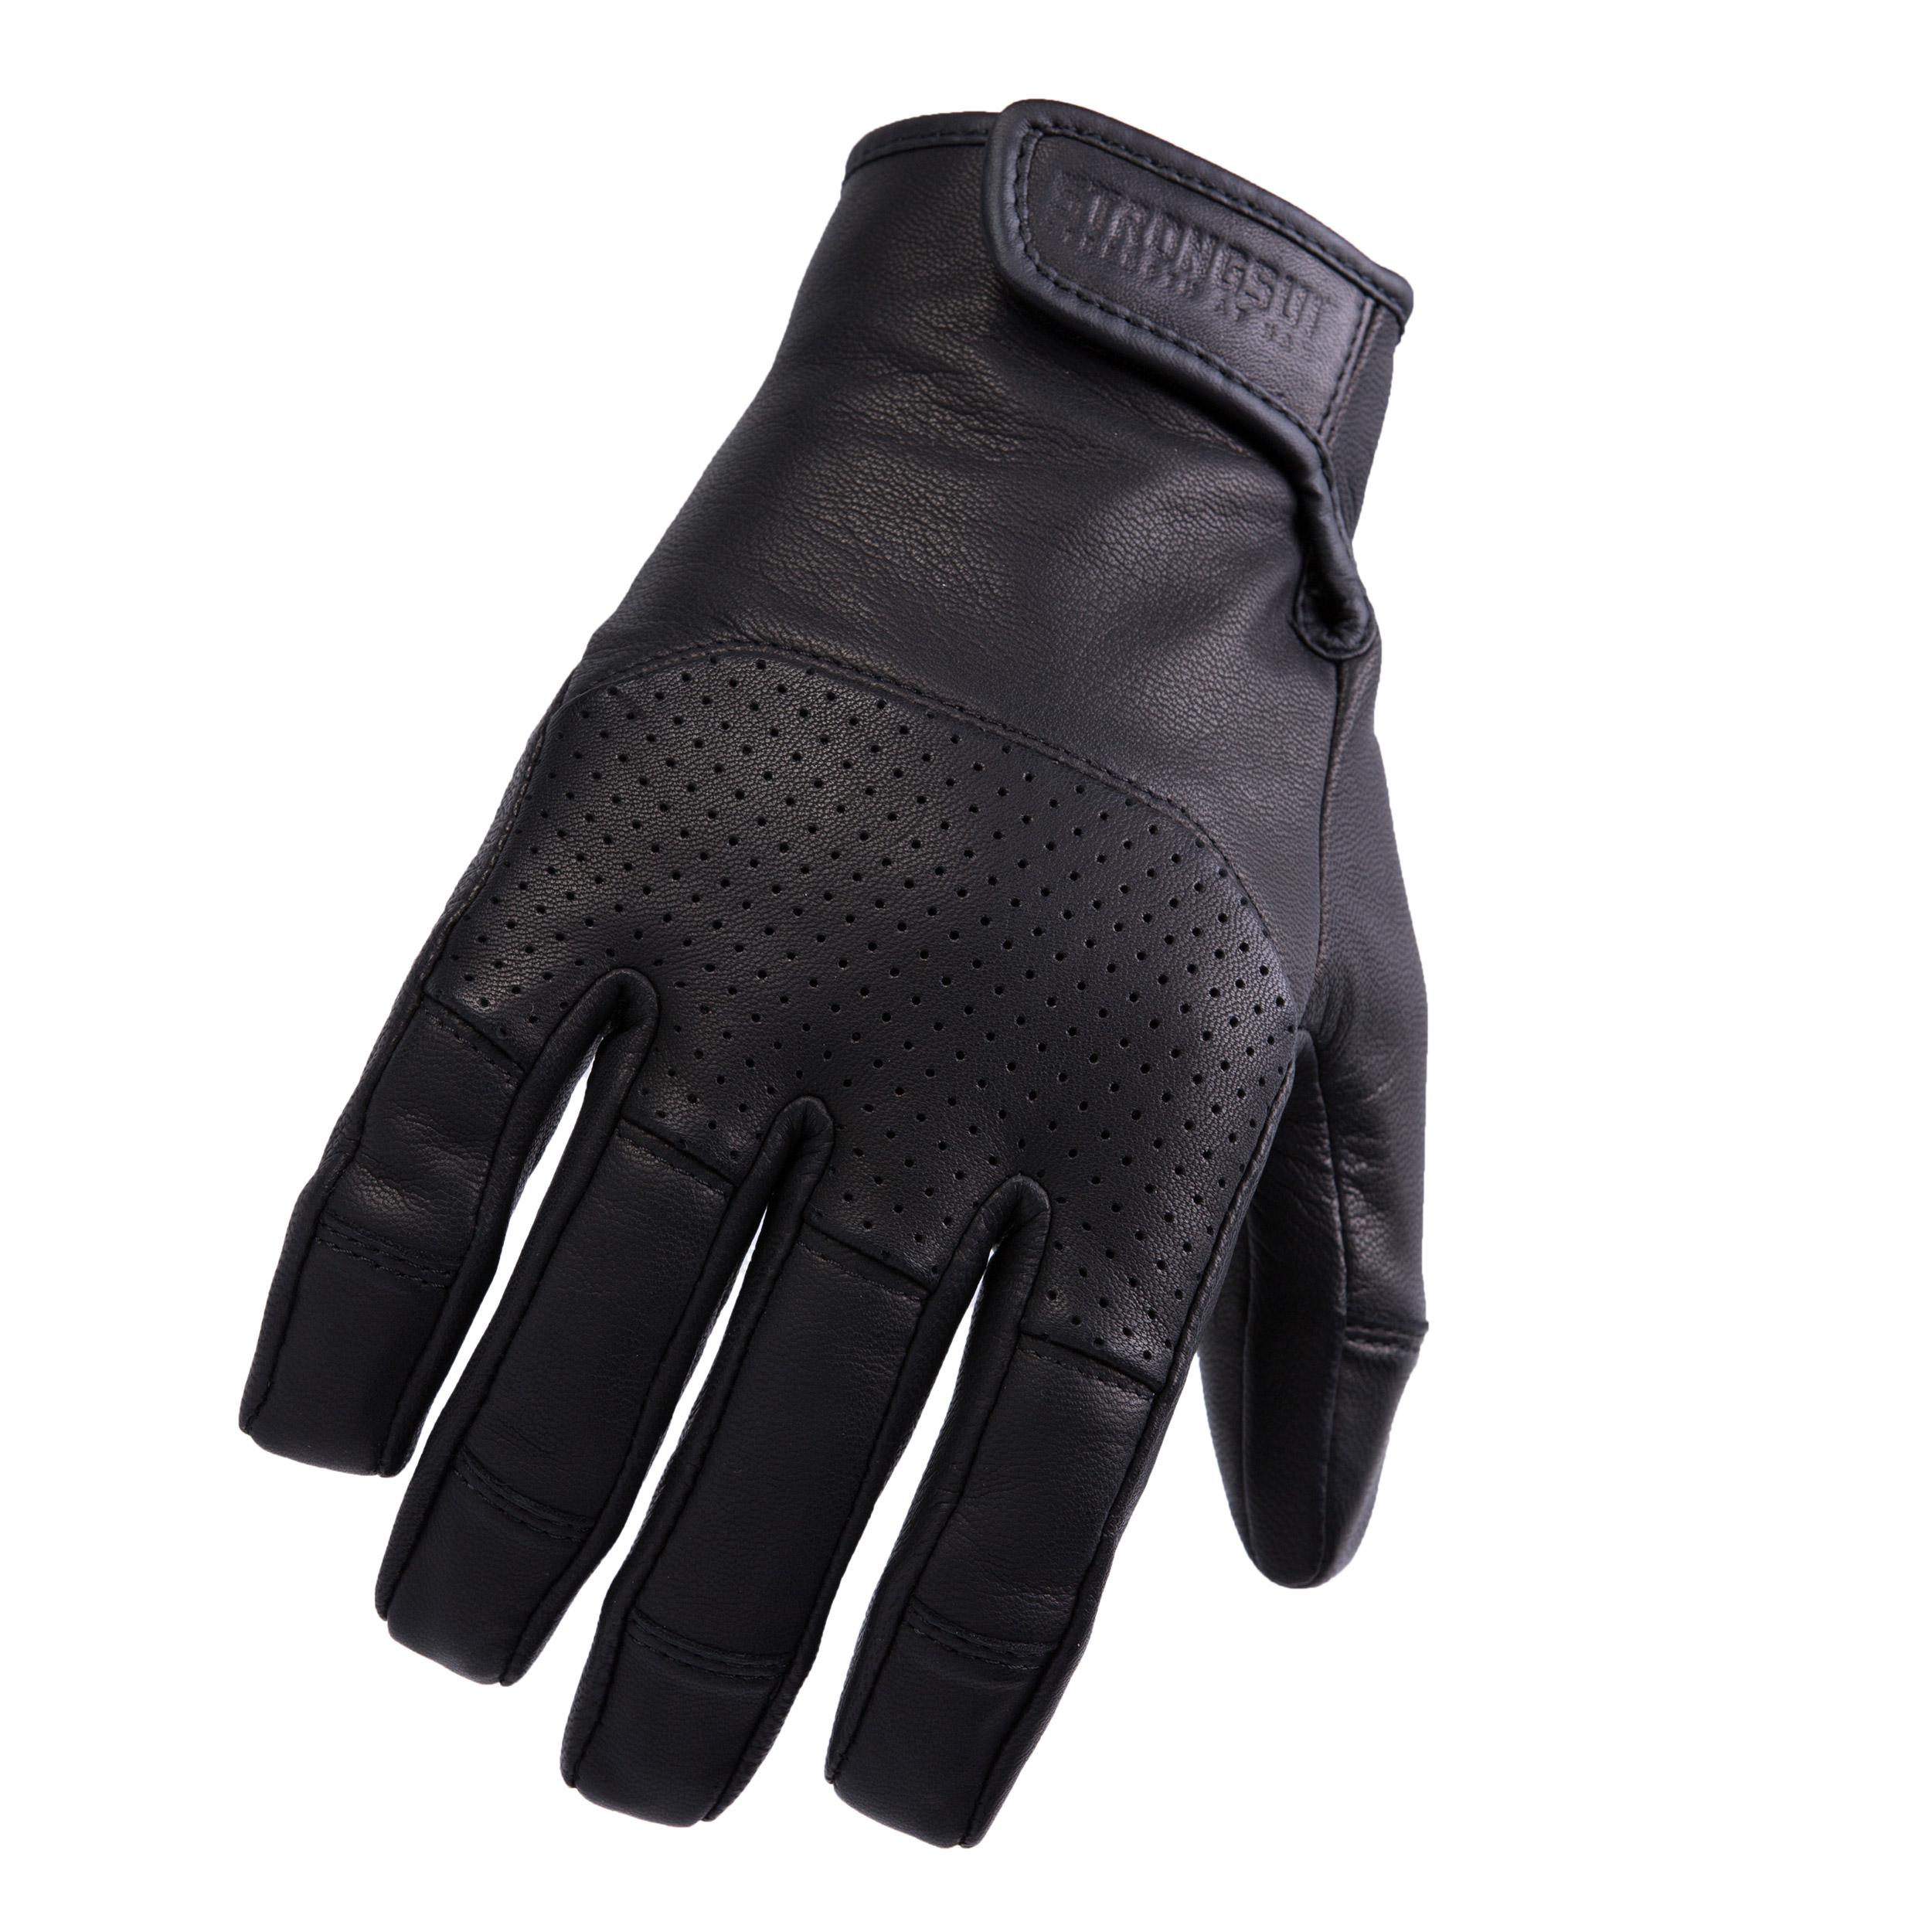 TecArmor Plus Gloves, XL